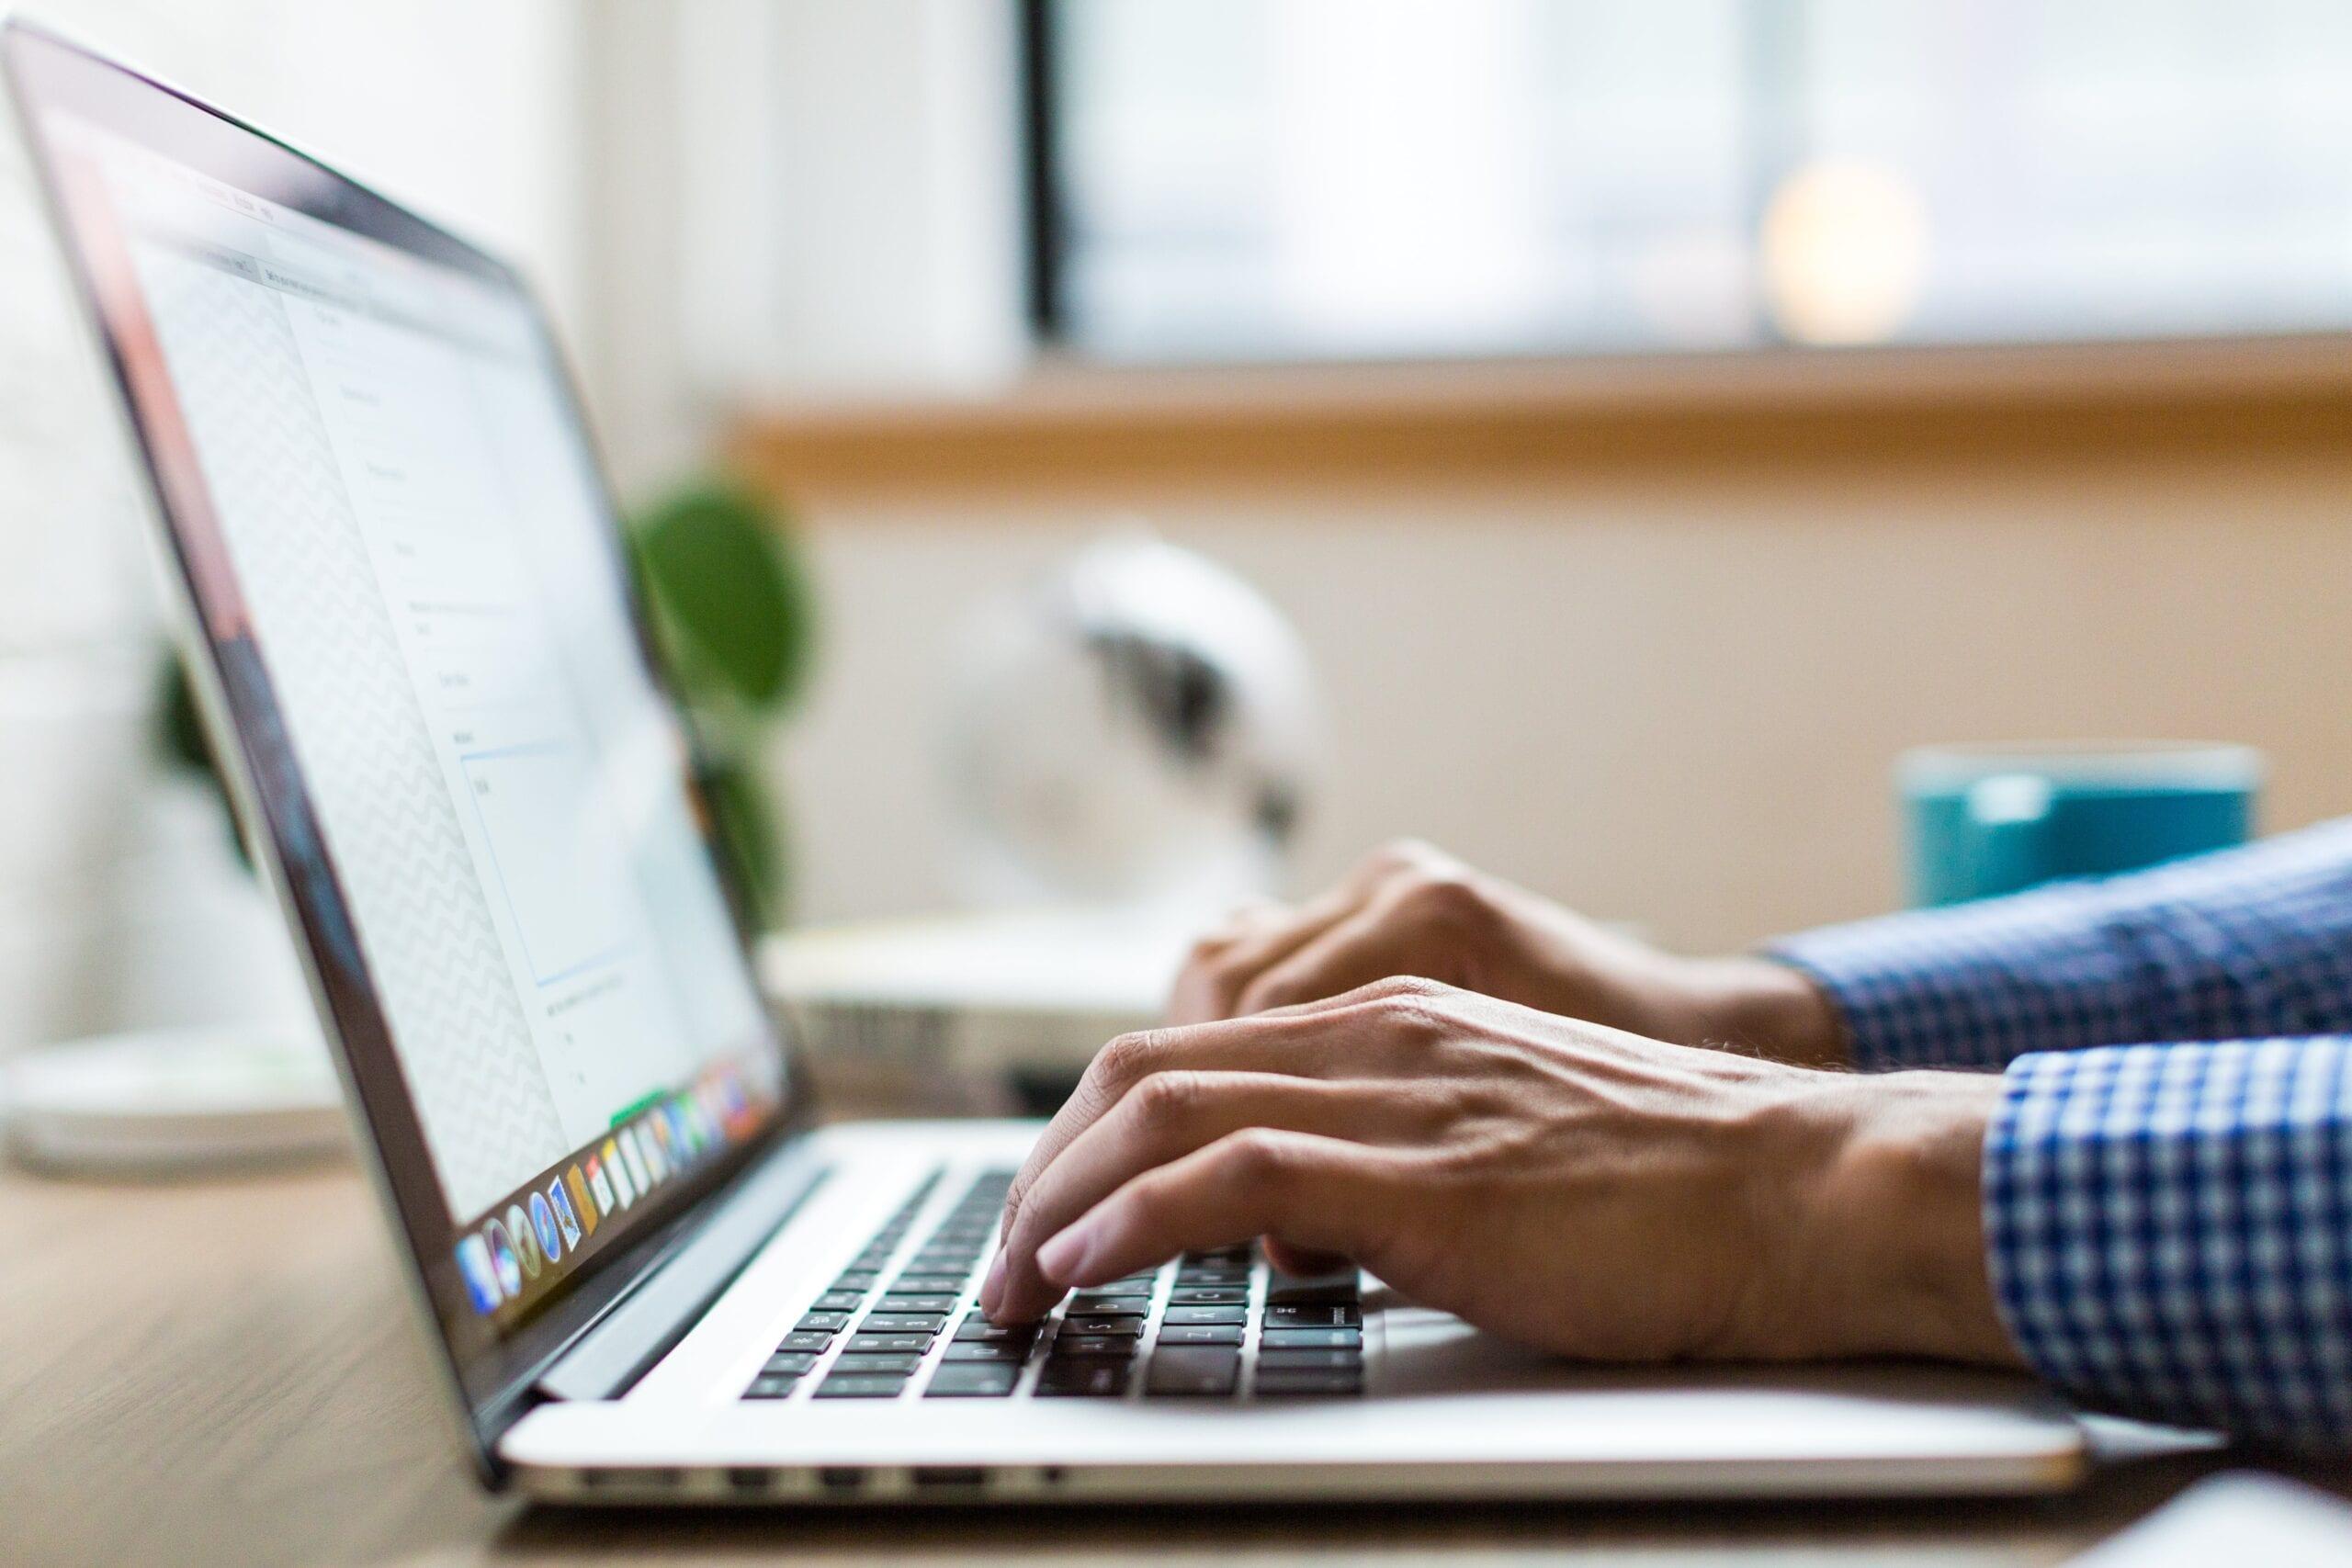 Man using computer to order online STD test